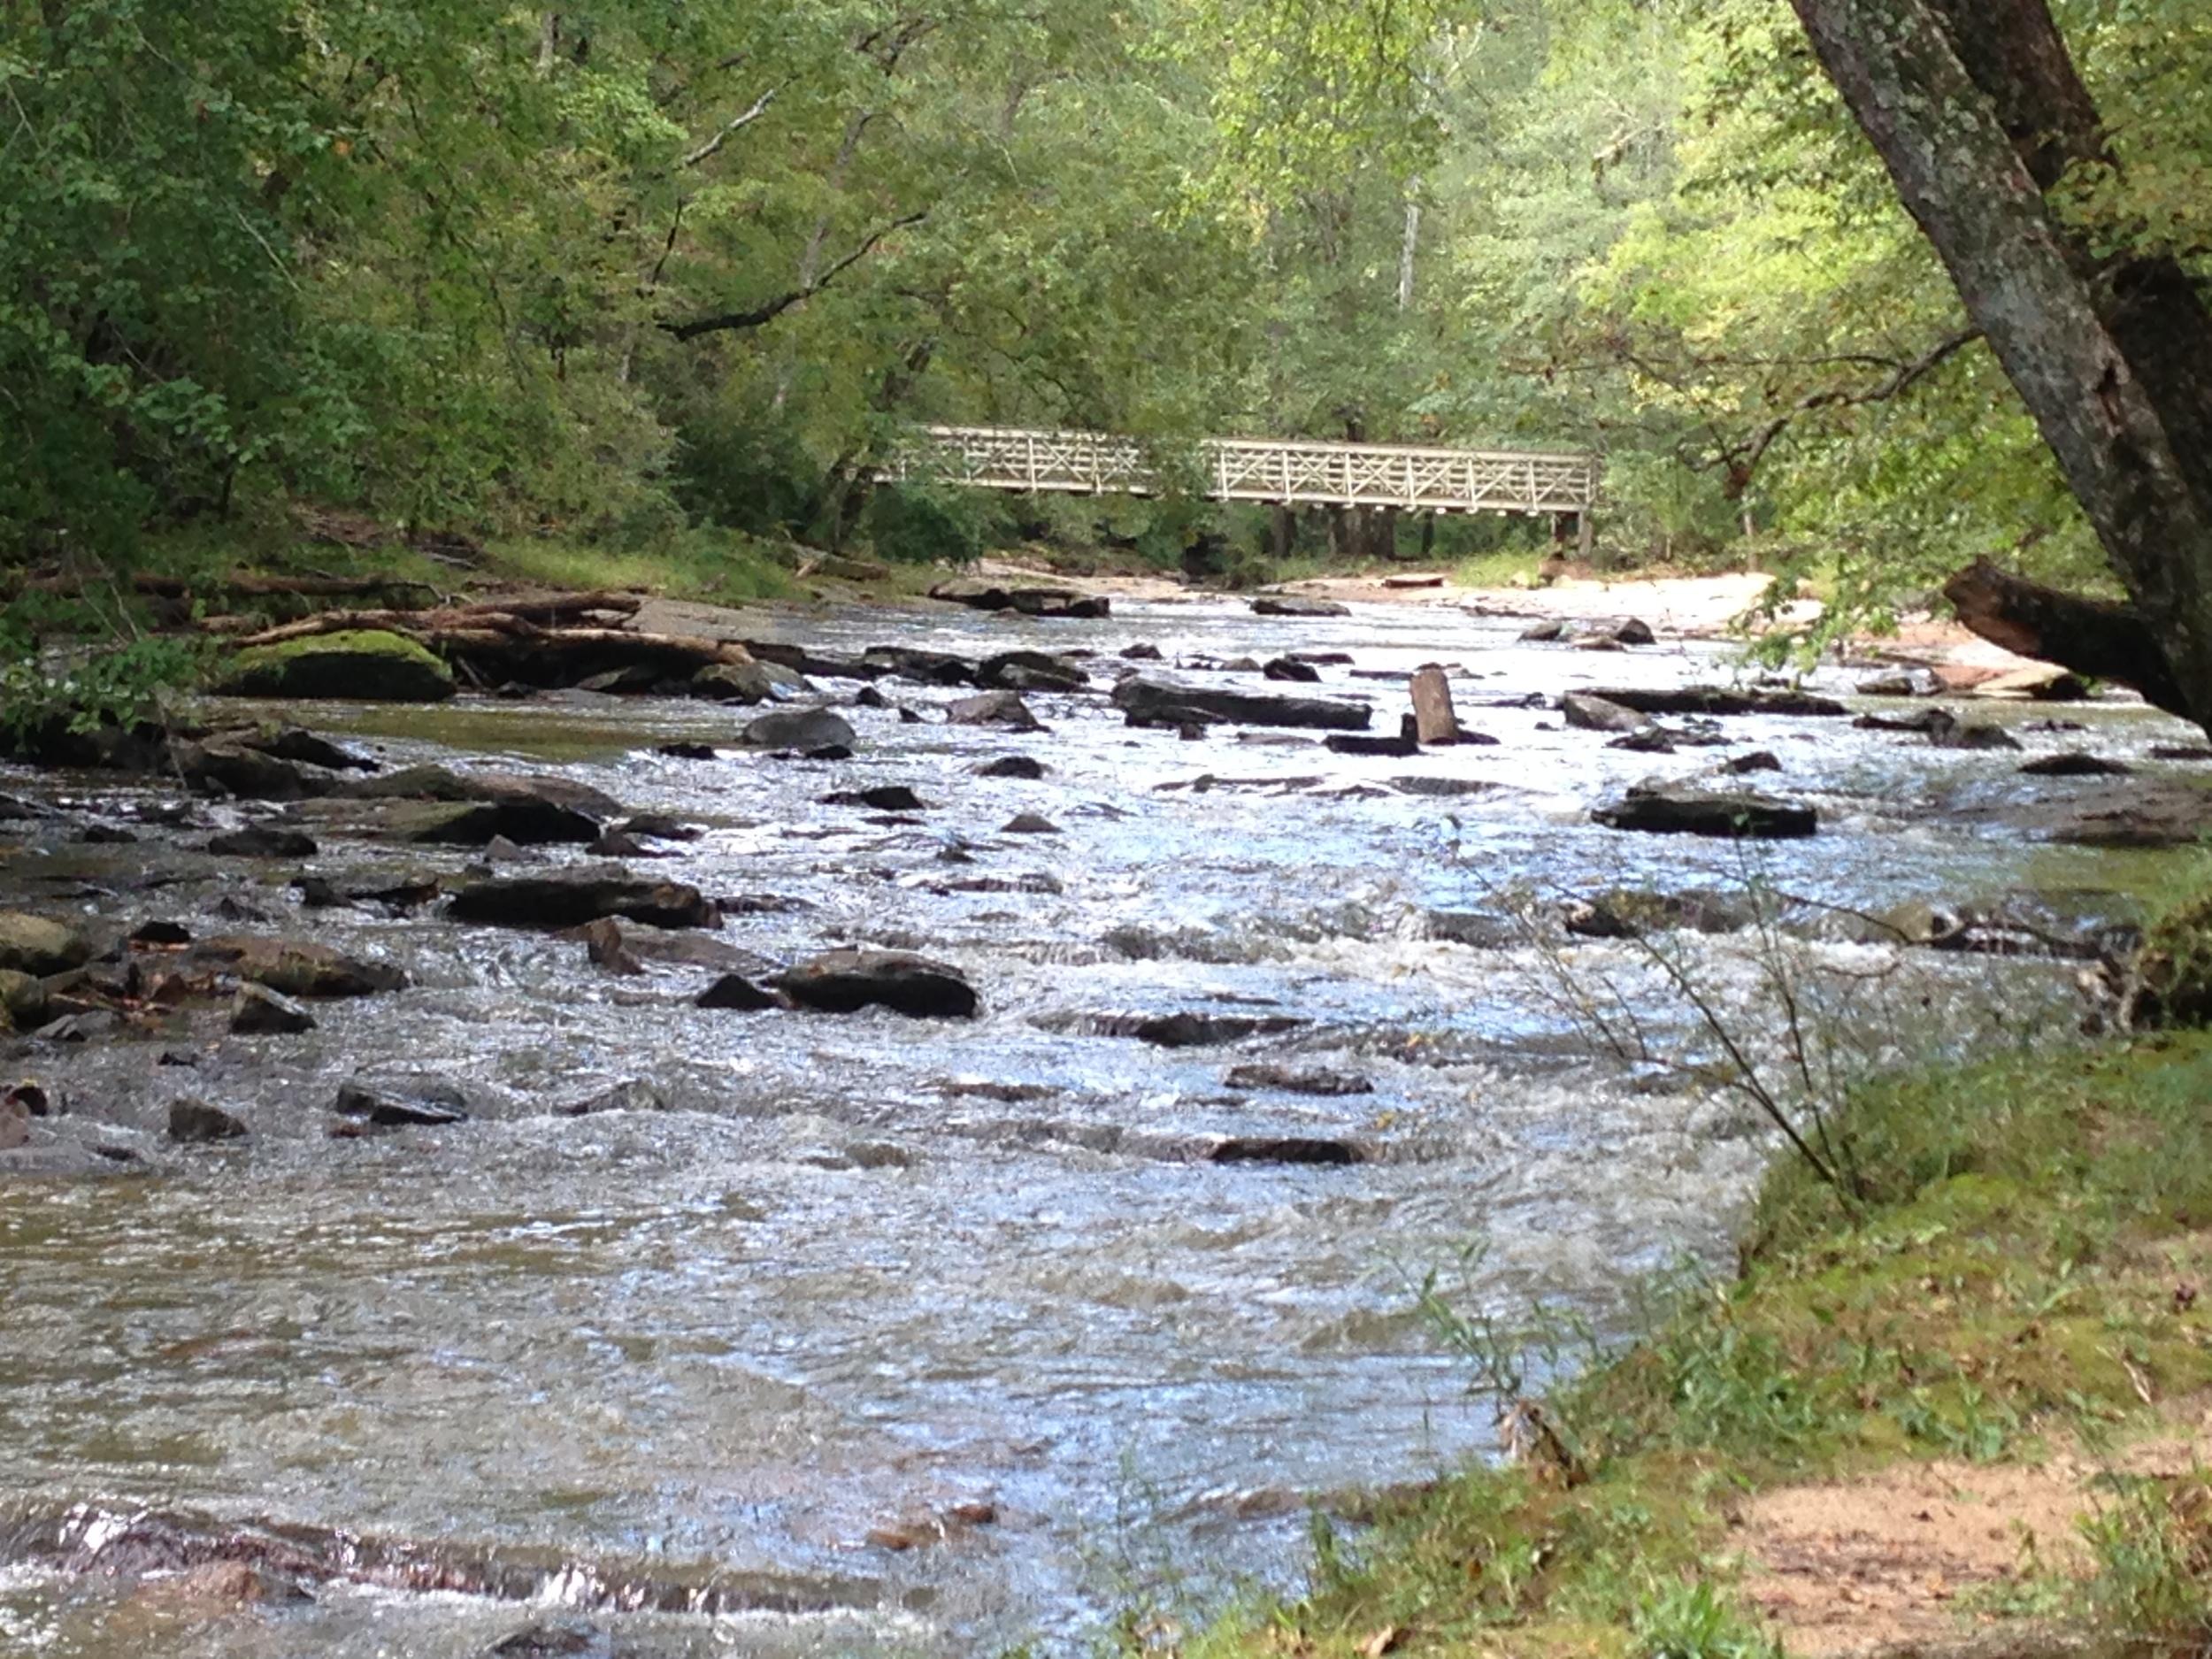 Rambling creek.